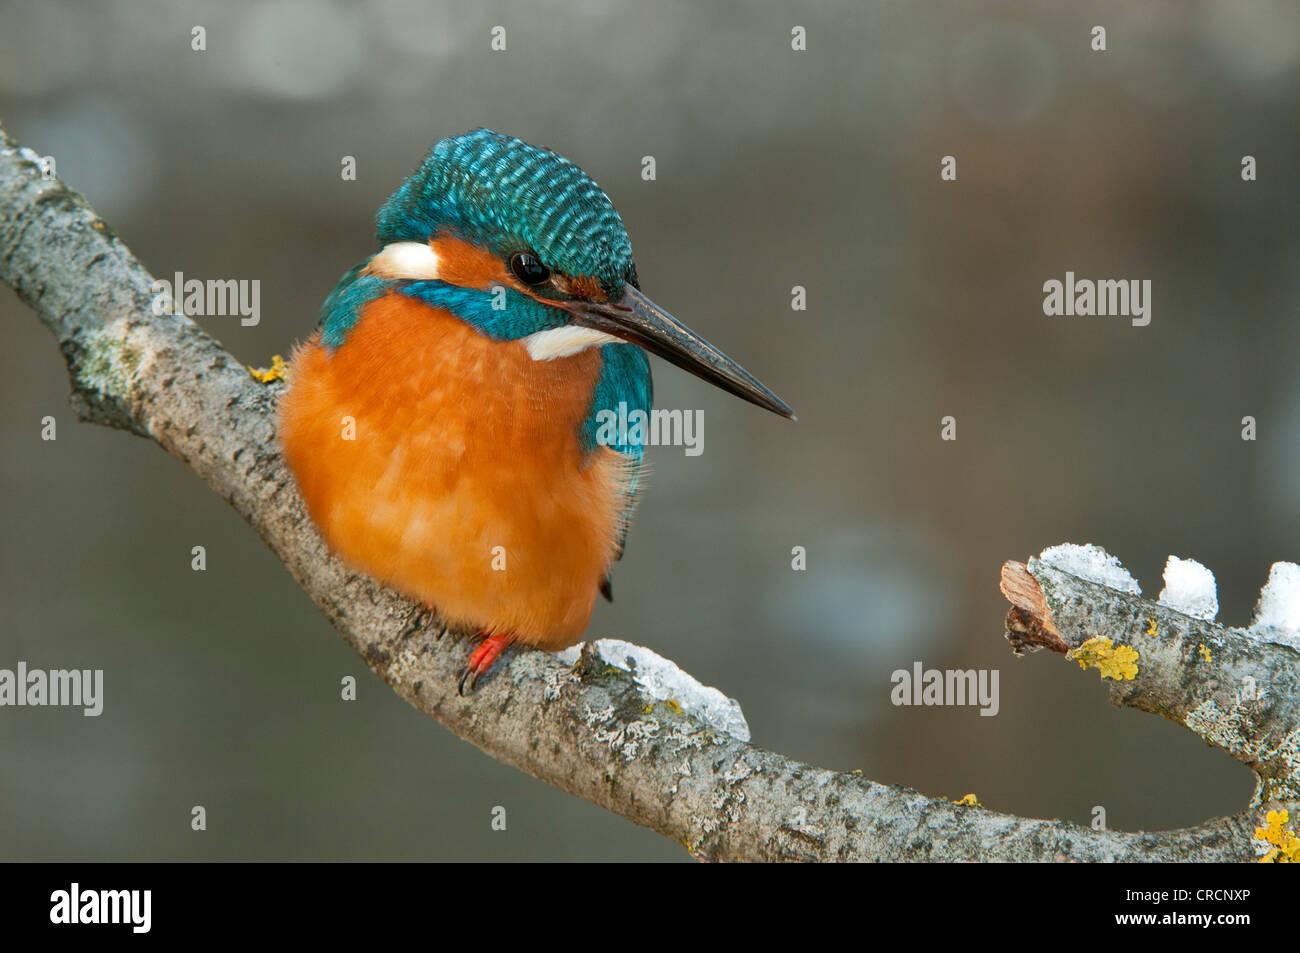 Kingfisher (Alcedo atthis), zone de conservation de Tratzberg, Tyrol, Autriche, Europe Photo Stock